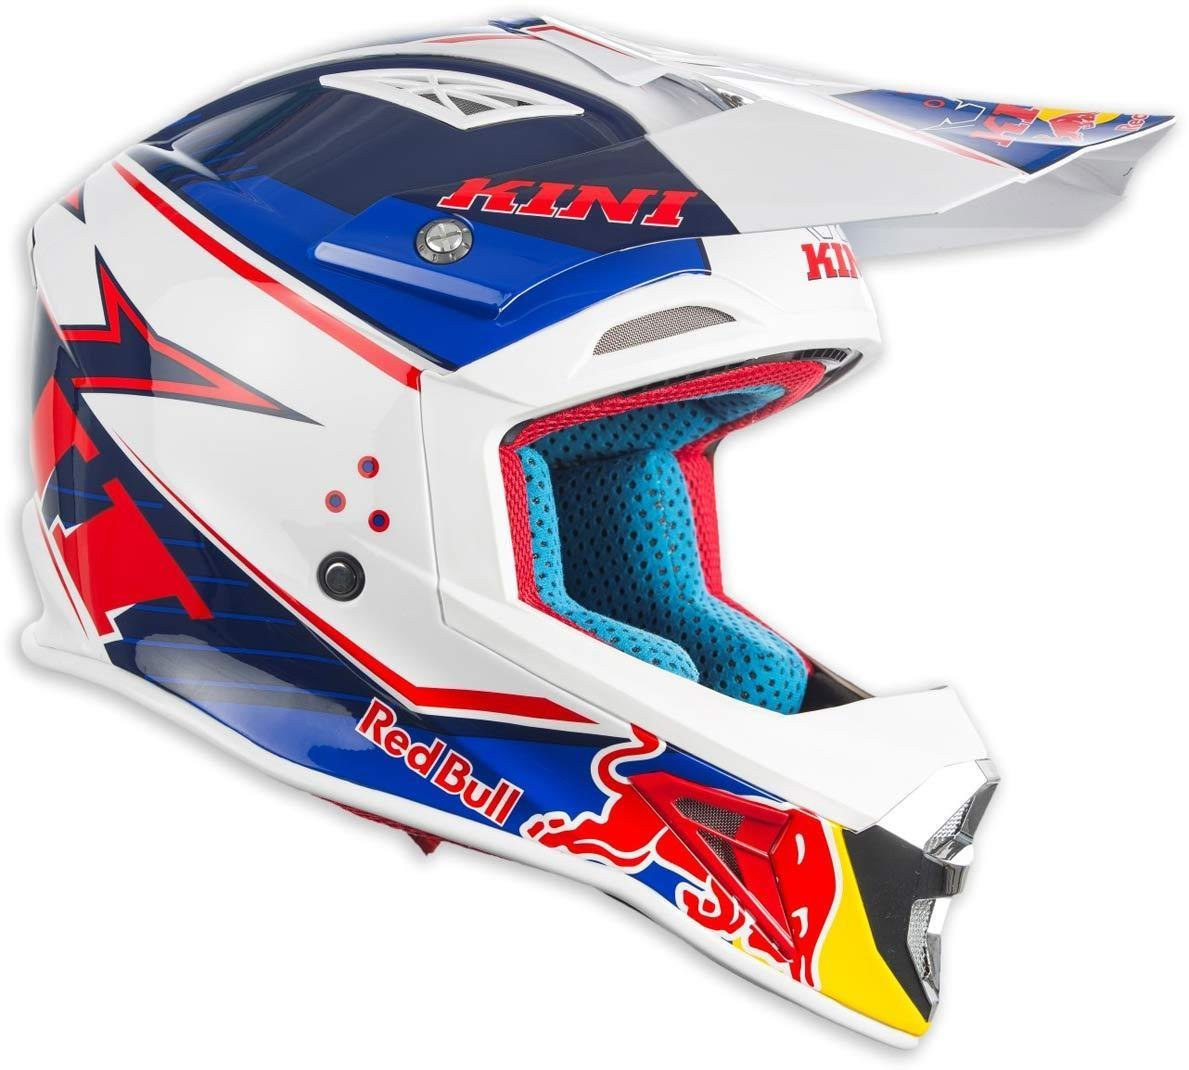 Kini Red Bull Competition Motocross Helmet Xs True Blue Vintage